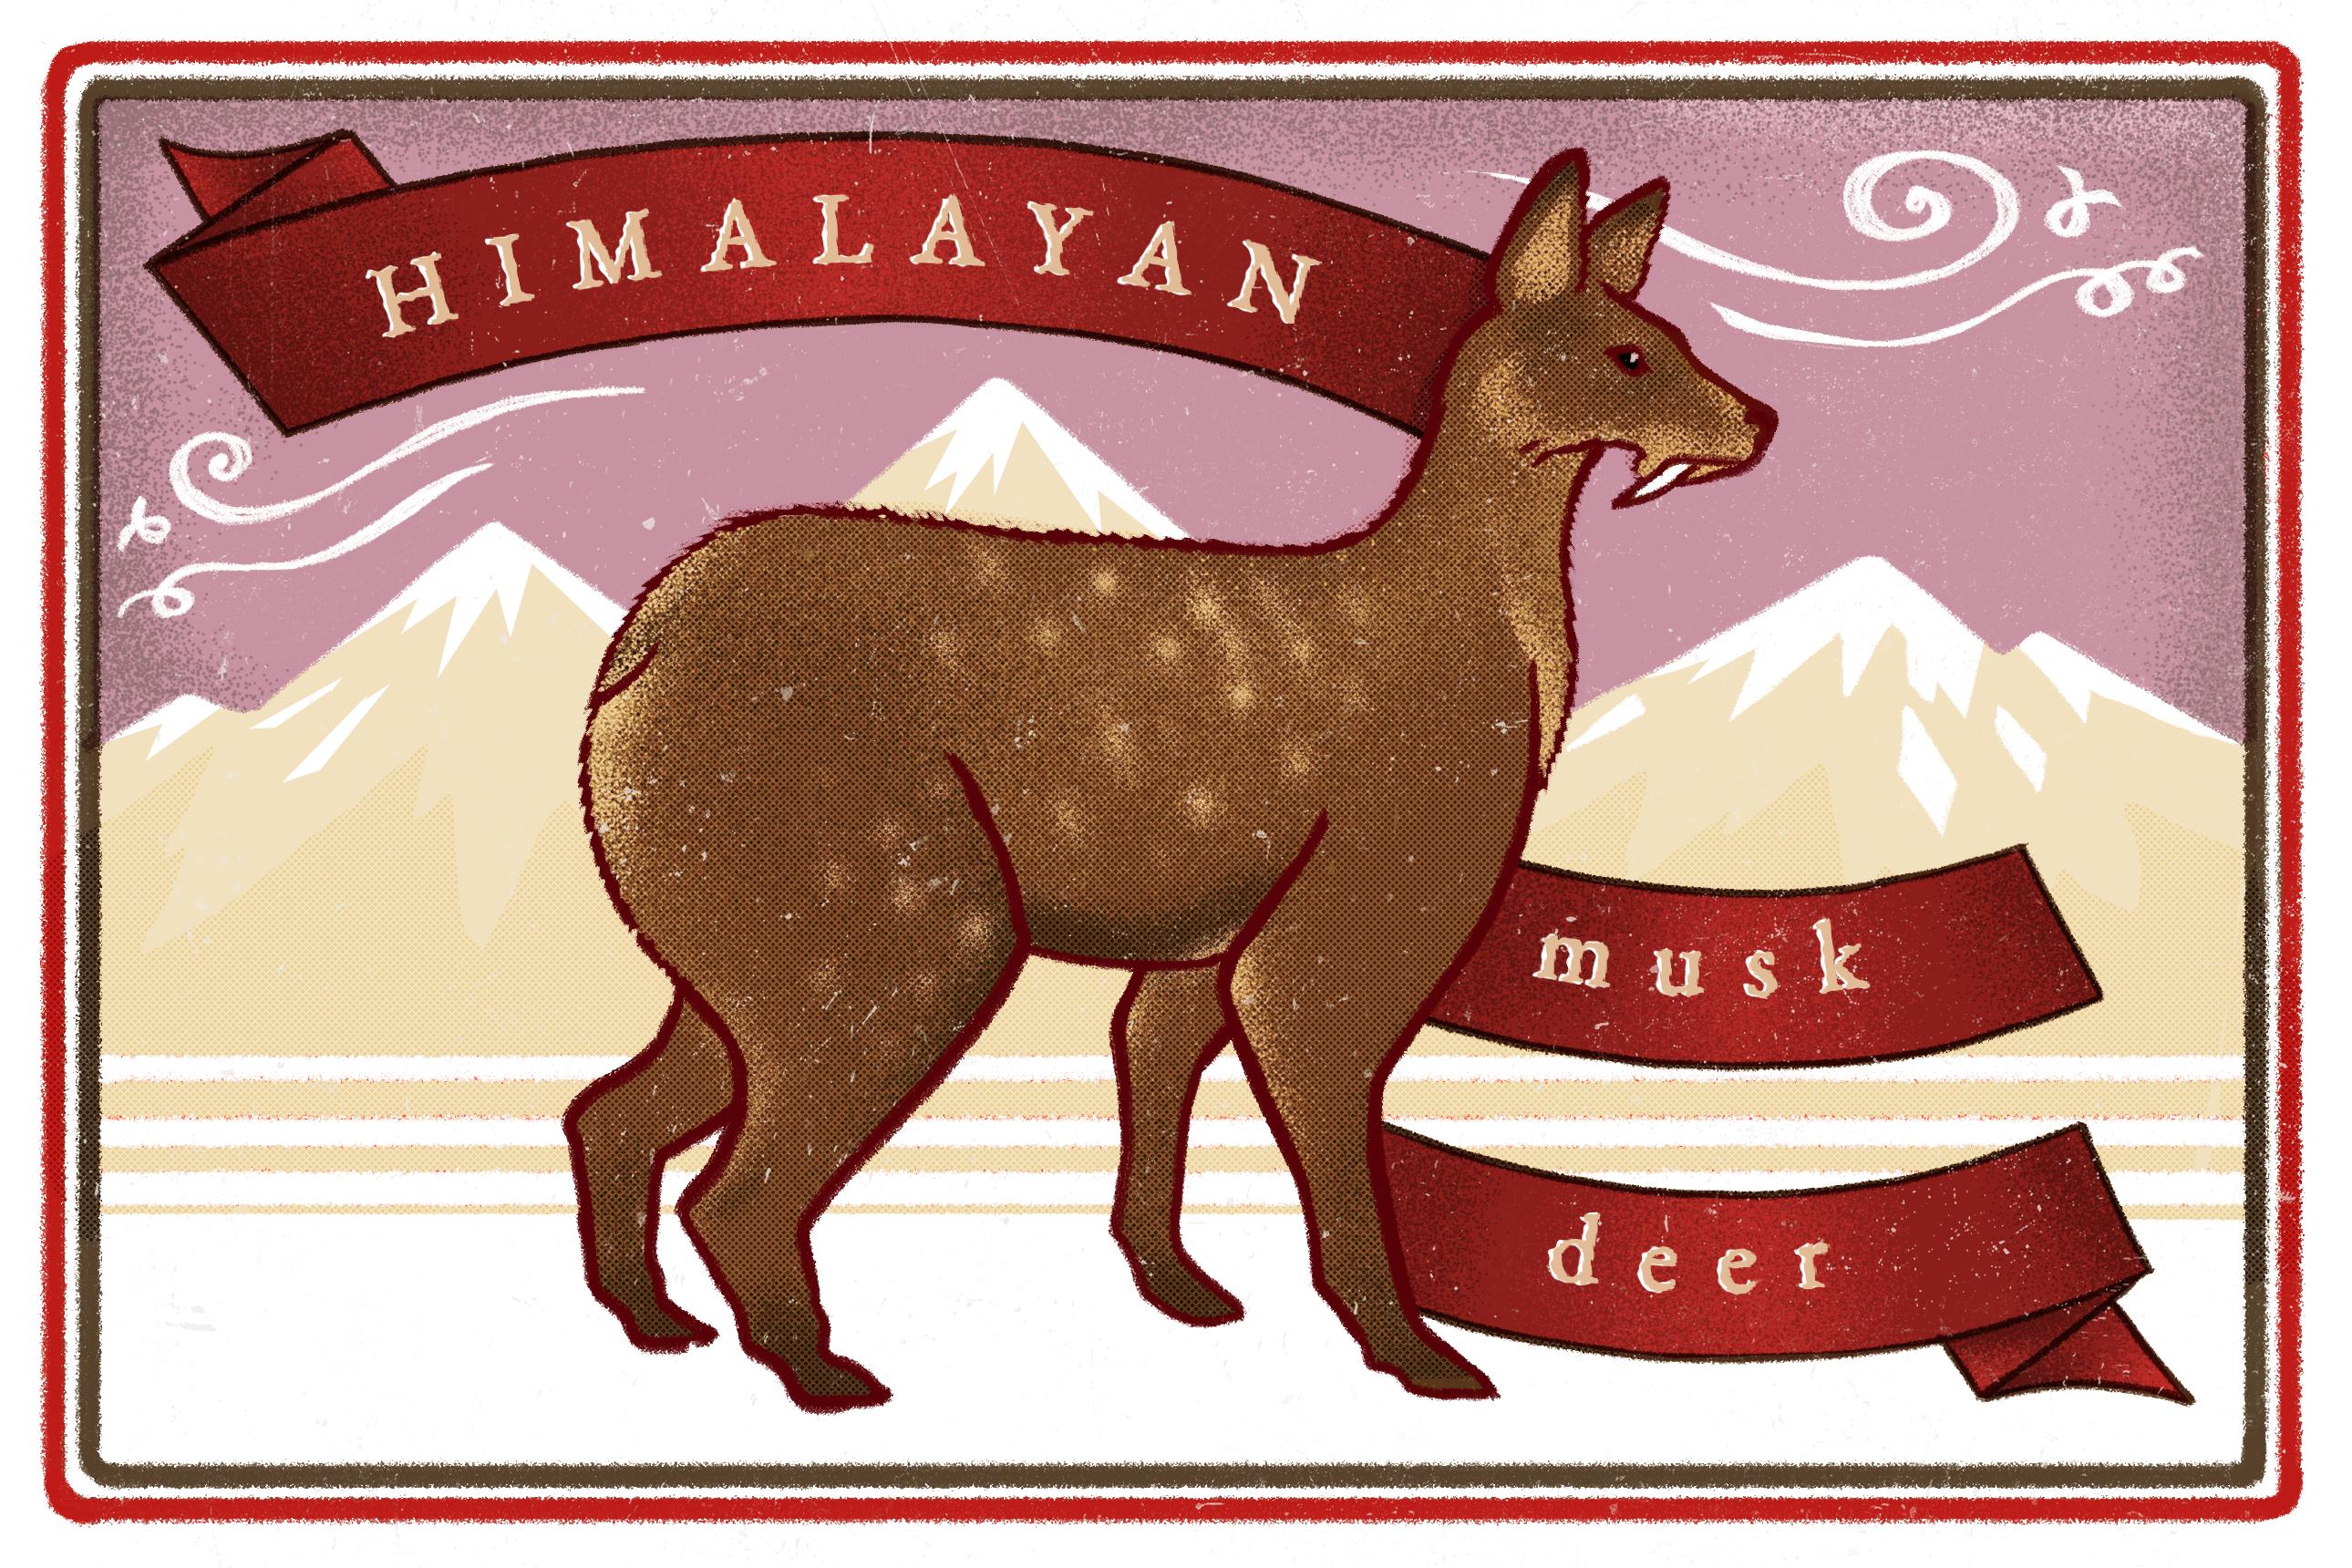 Illustration of Himalayan musk deer by Kabini Amin